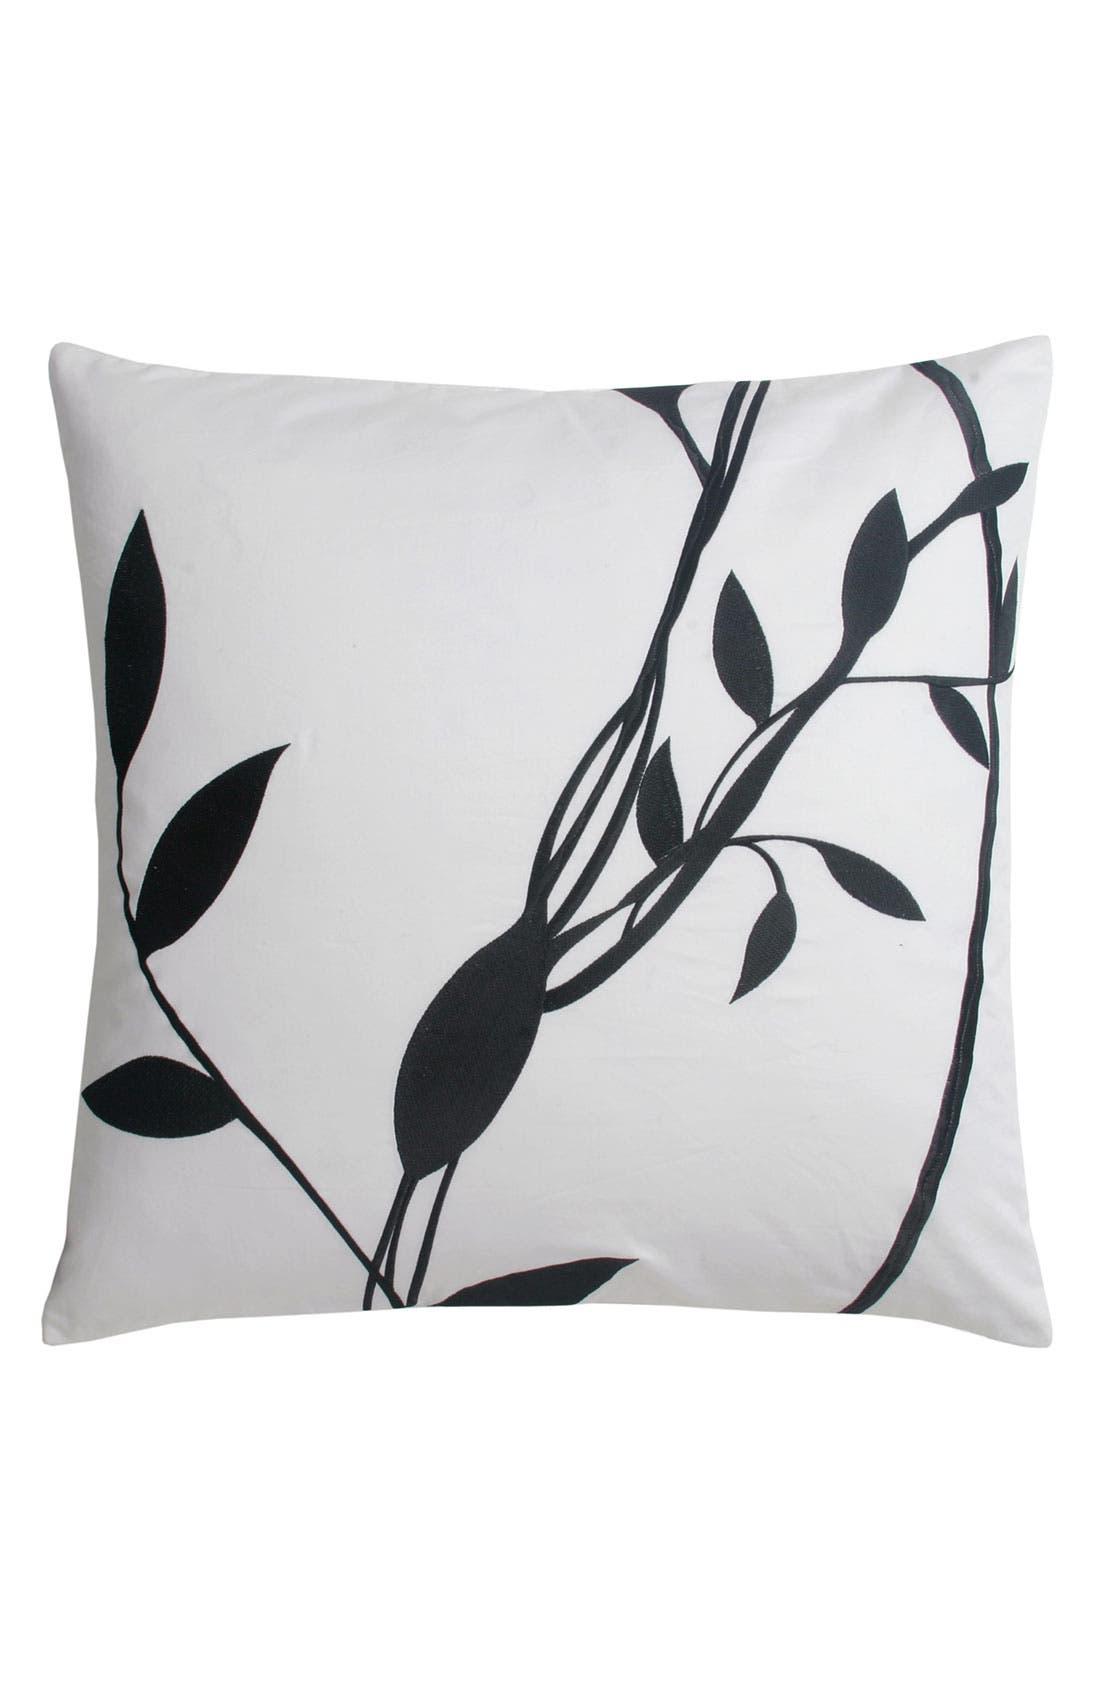 Alternate Image 1 Selected - Blissliving Home 'Manhattan' Pillow (Online Only)